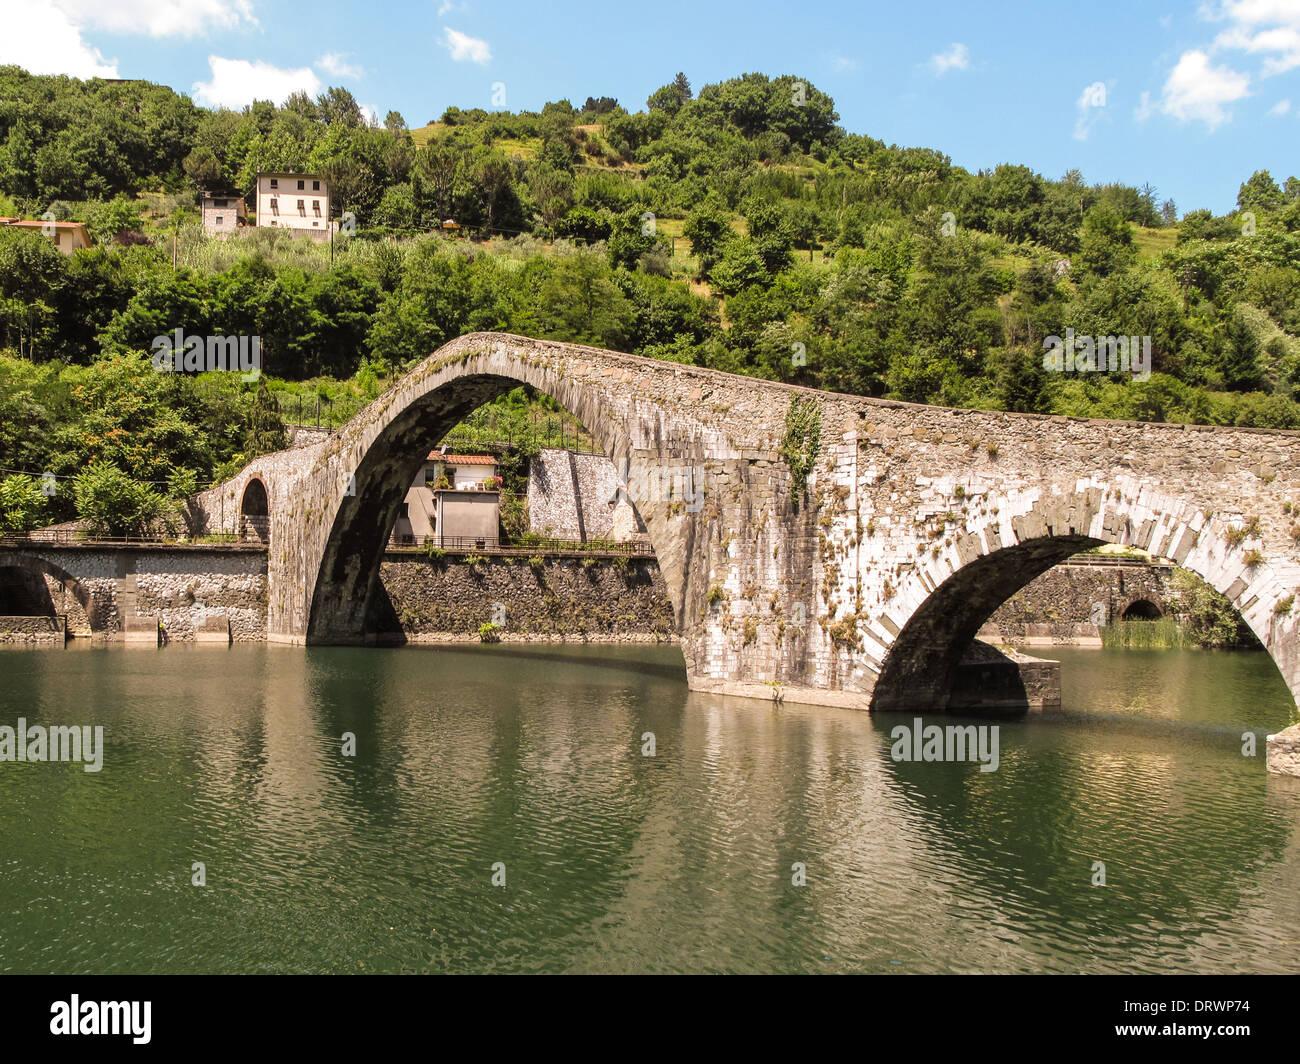 Medieval bridge near Bagni Di Lucca, Italy Stock Photo: 66334440 - Alamy